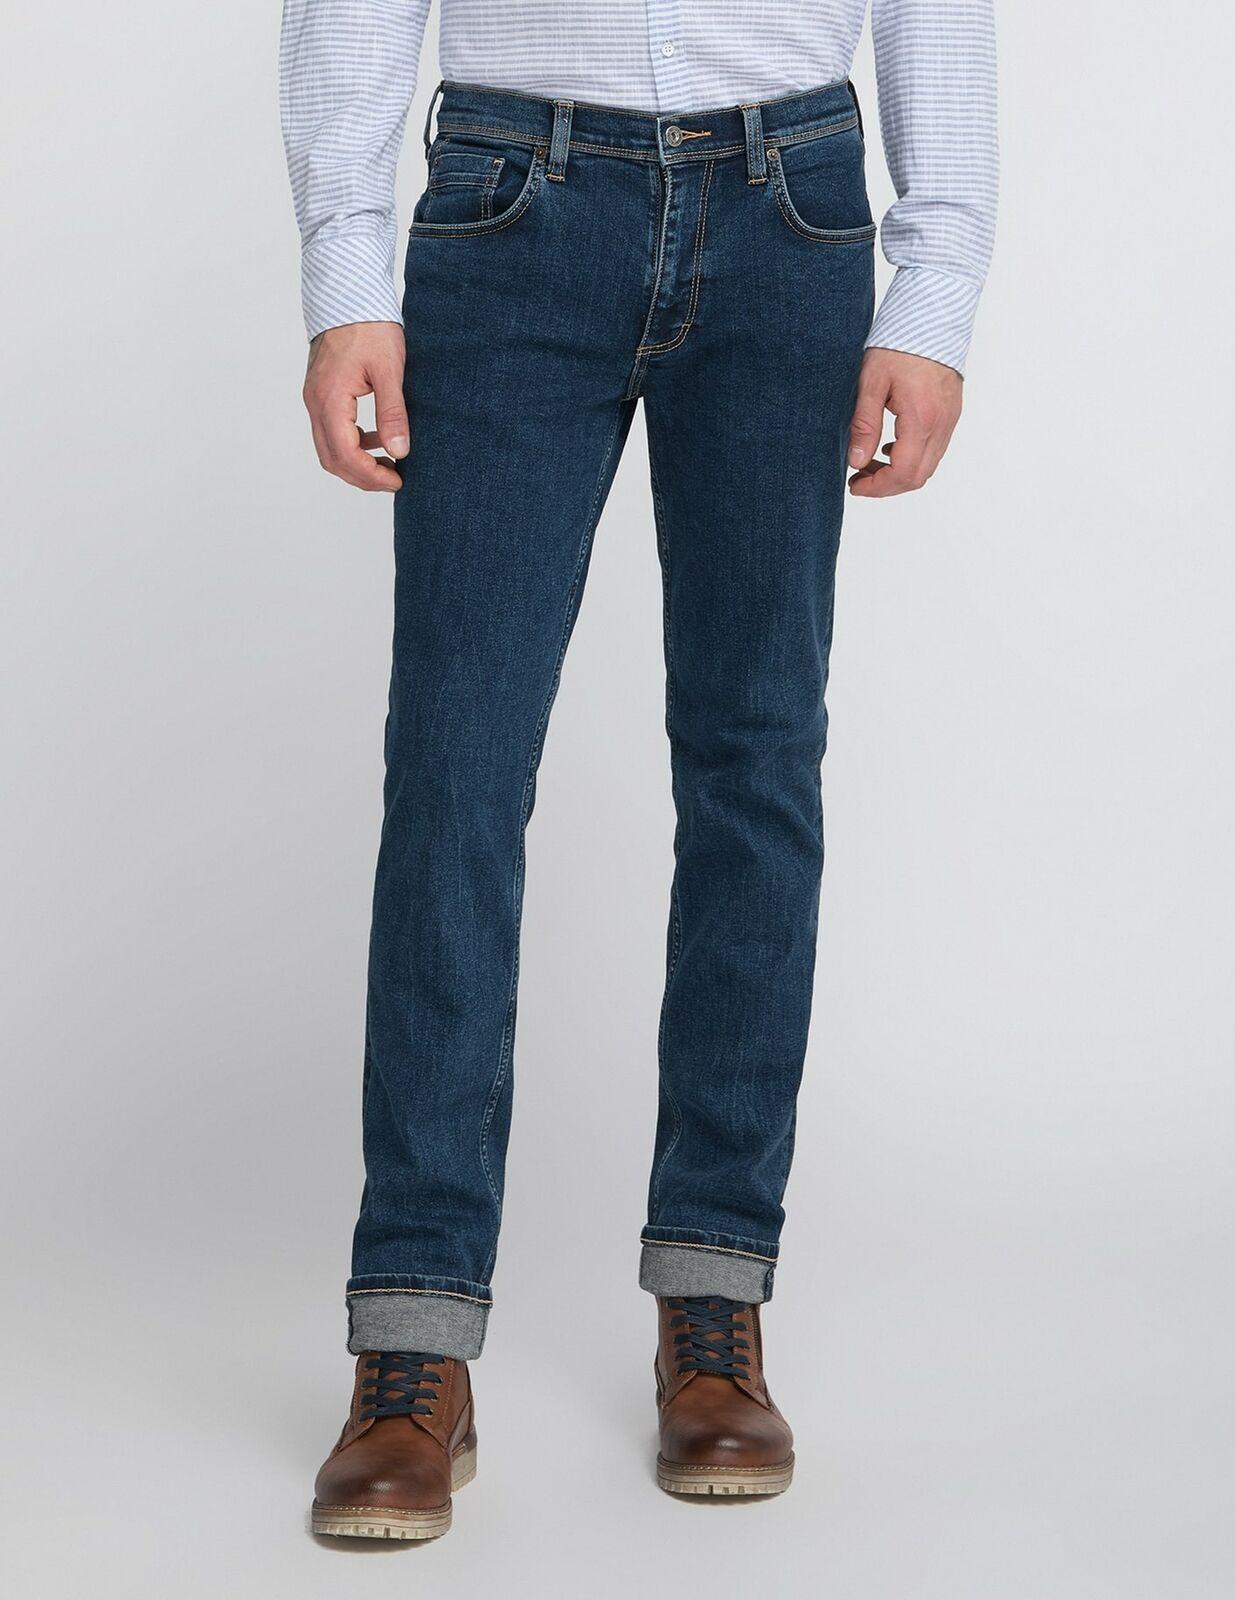 Mustang Washington Herren be flexible Jeans, Länge: L38 / L40 / Used Optik